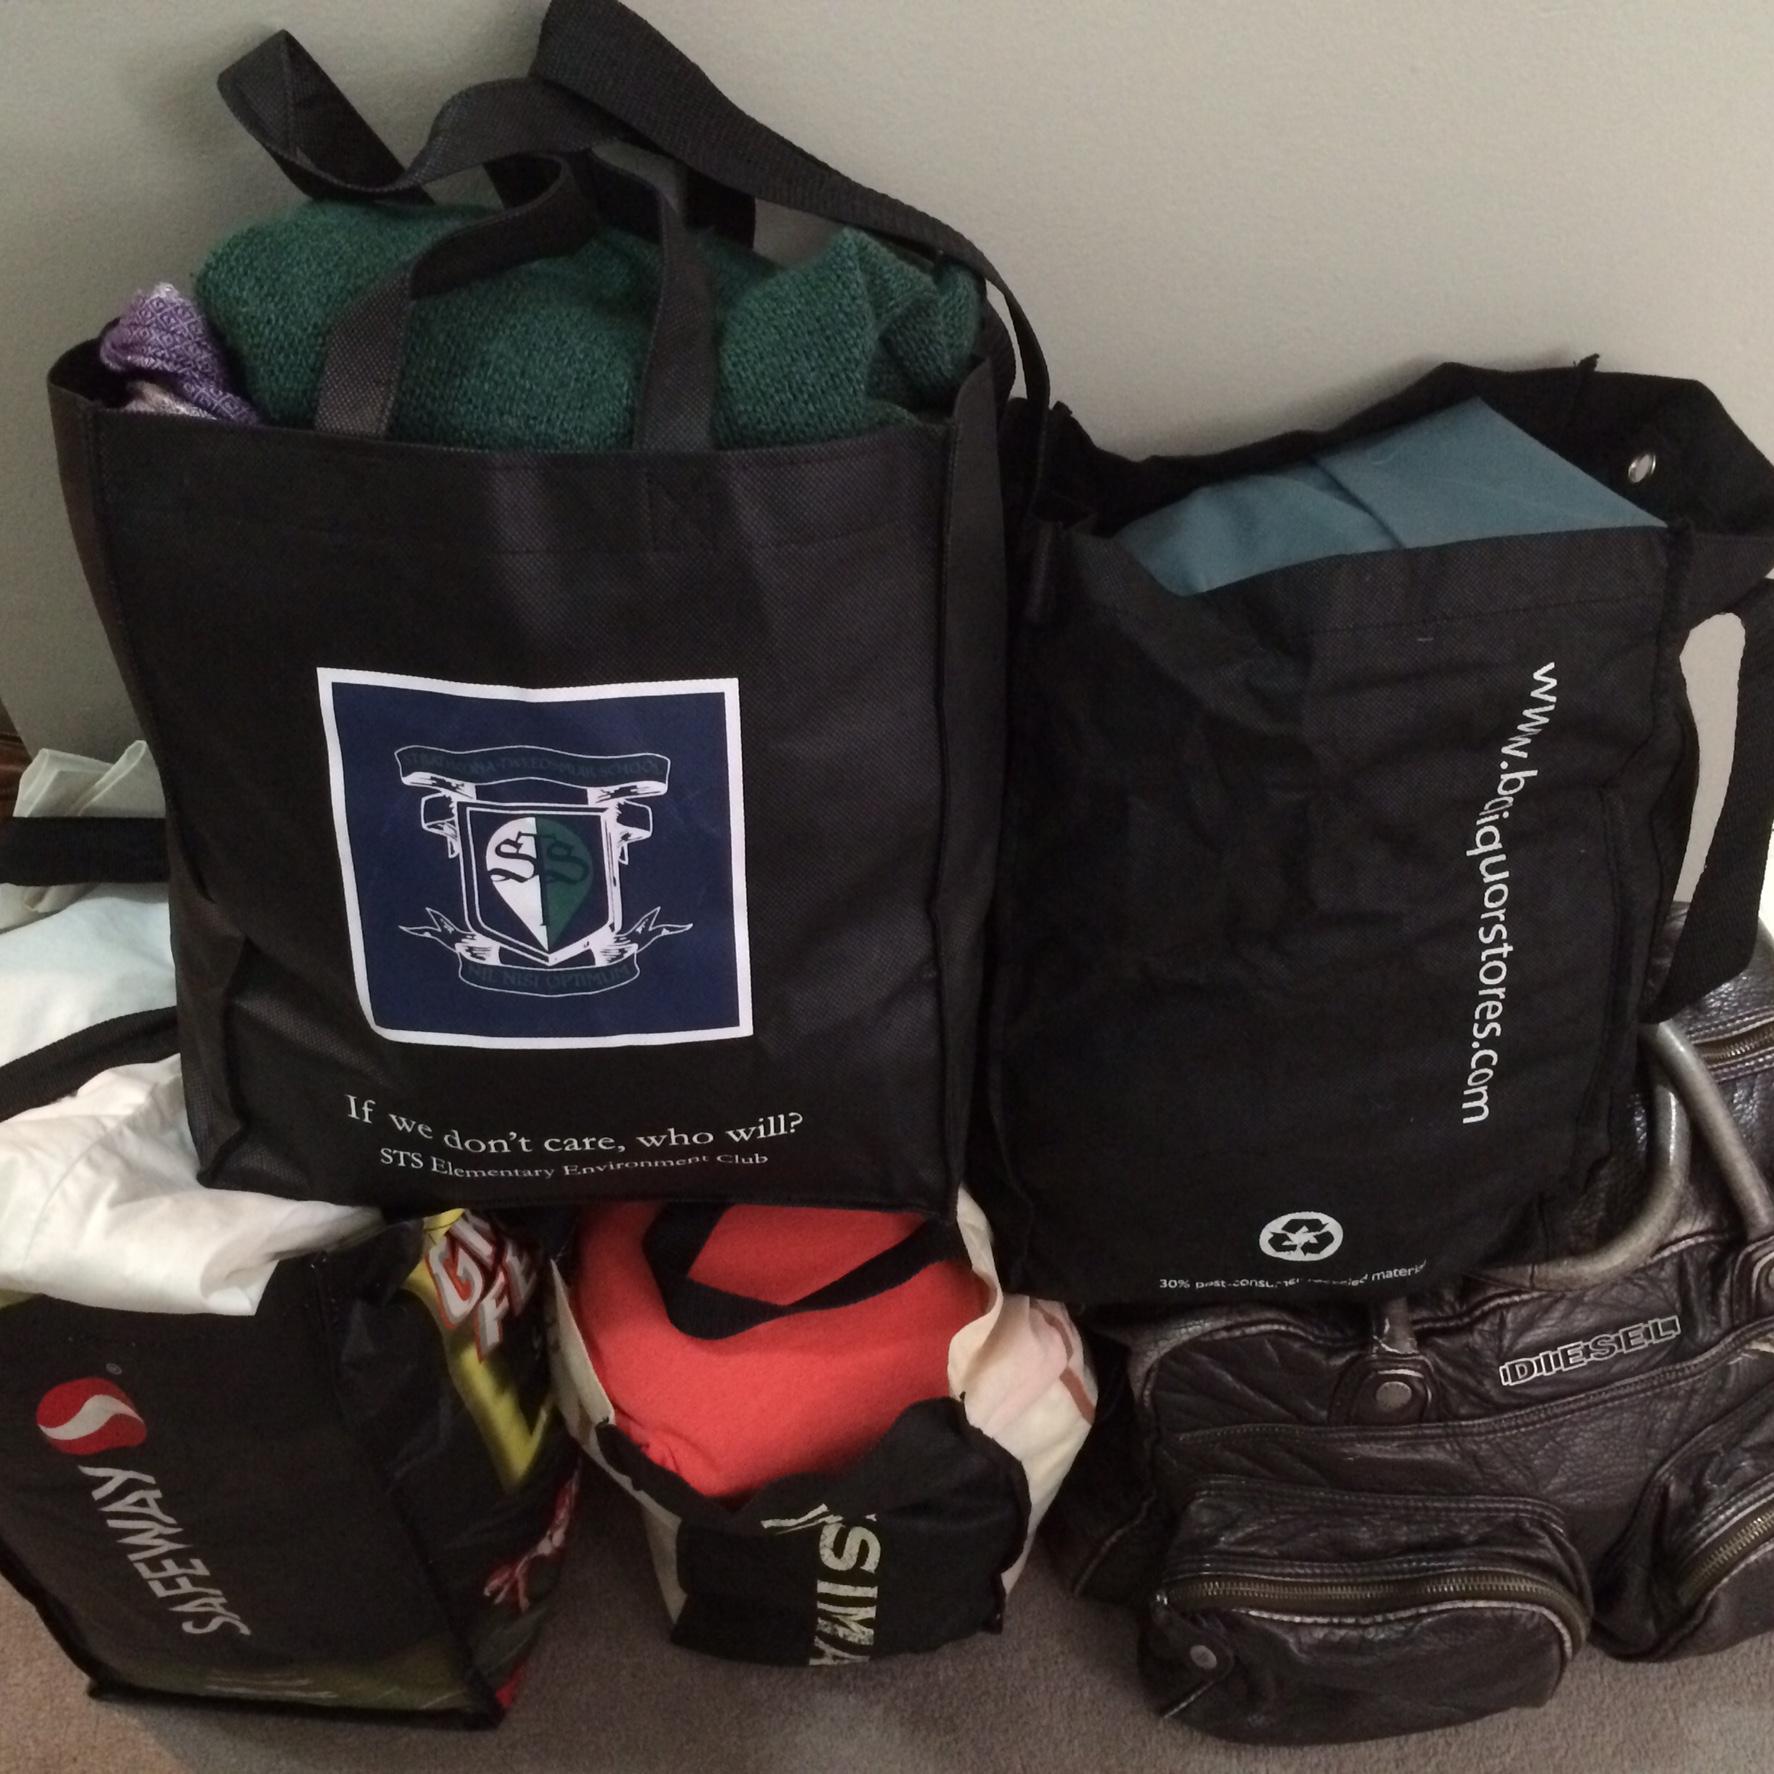 donatedclothes.JPG